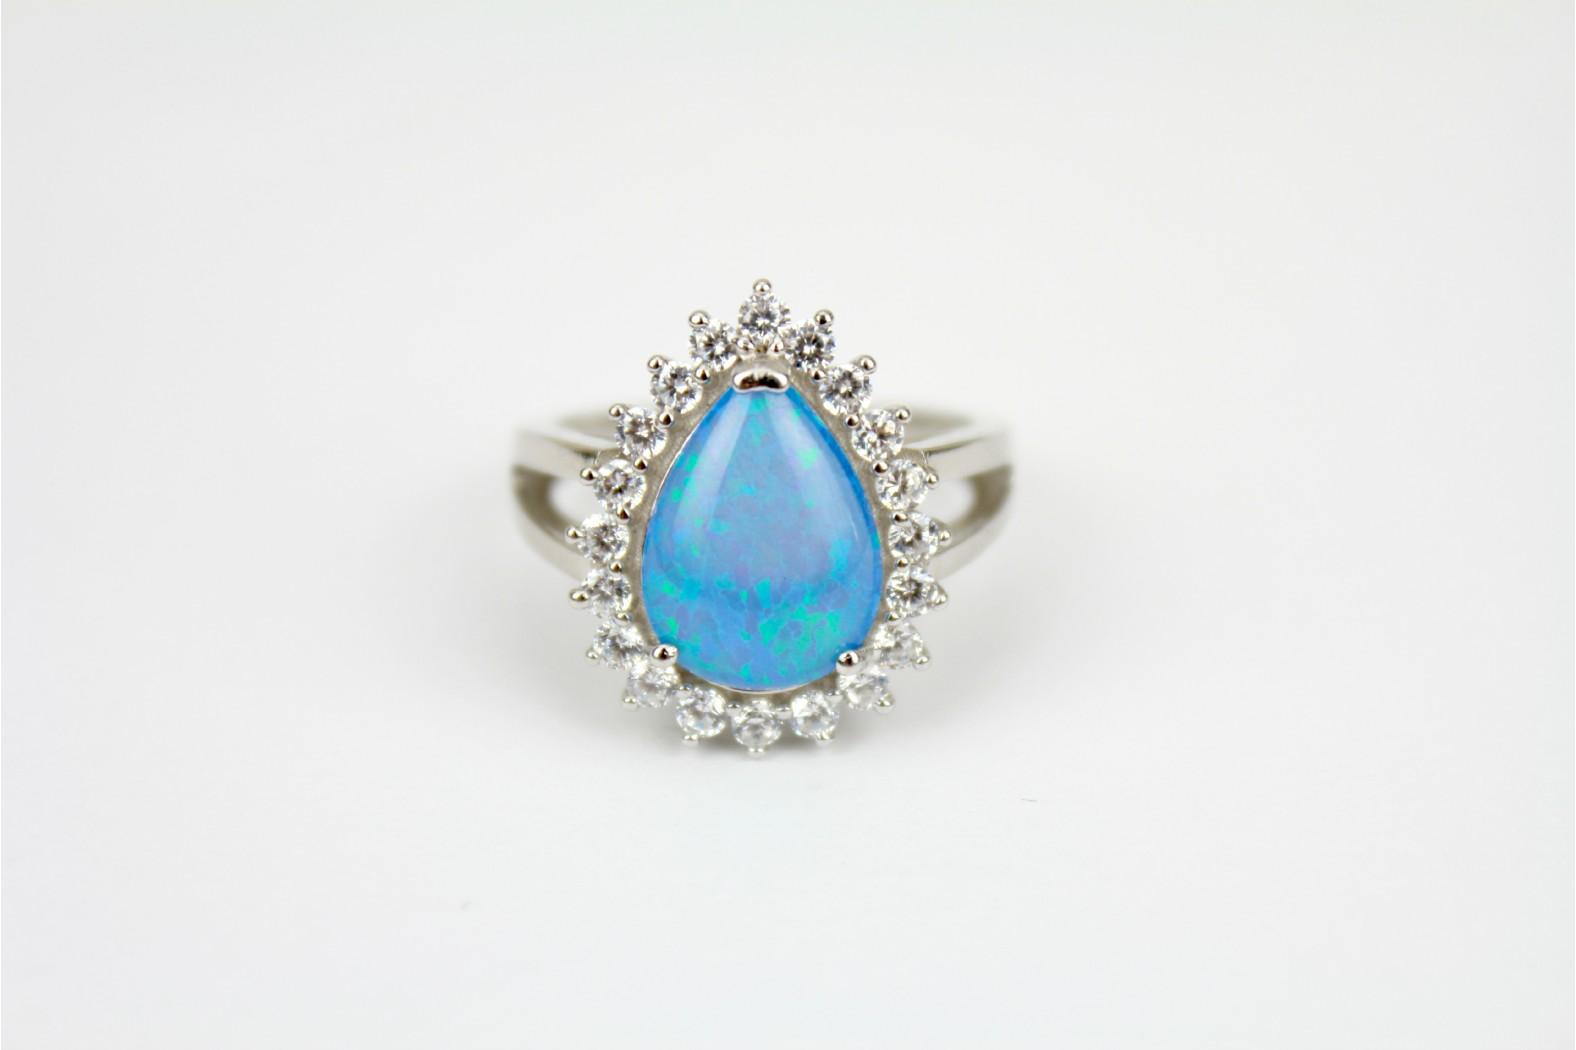 Blue Opal fire Teardrop shape embellished with cubic zirconia size 8 or P